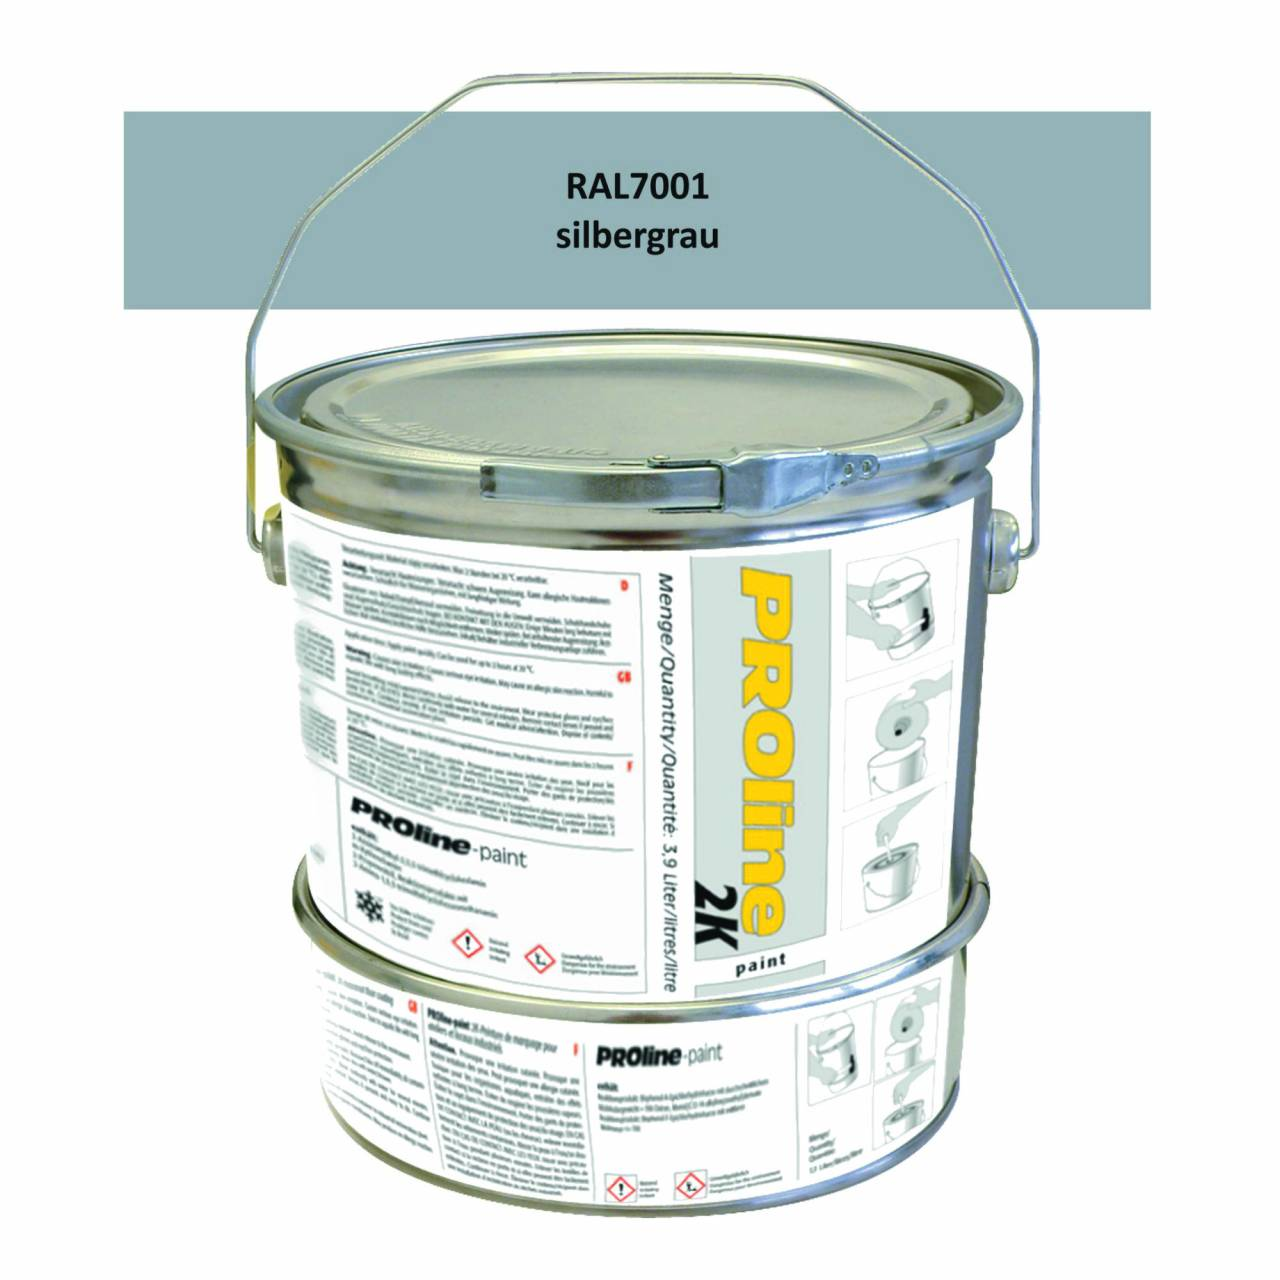 Hallen-Markierfarbe 2K 'PROline-paint' SILBERGRAU / Gebinde a 5,0 Liter